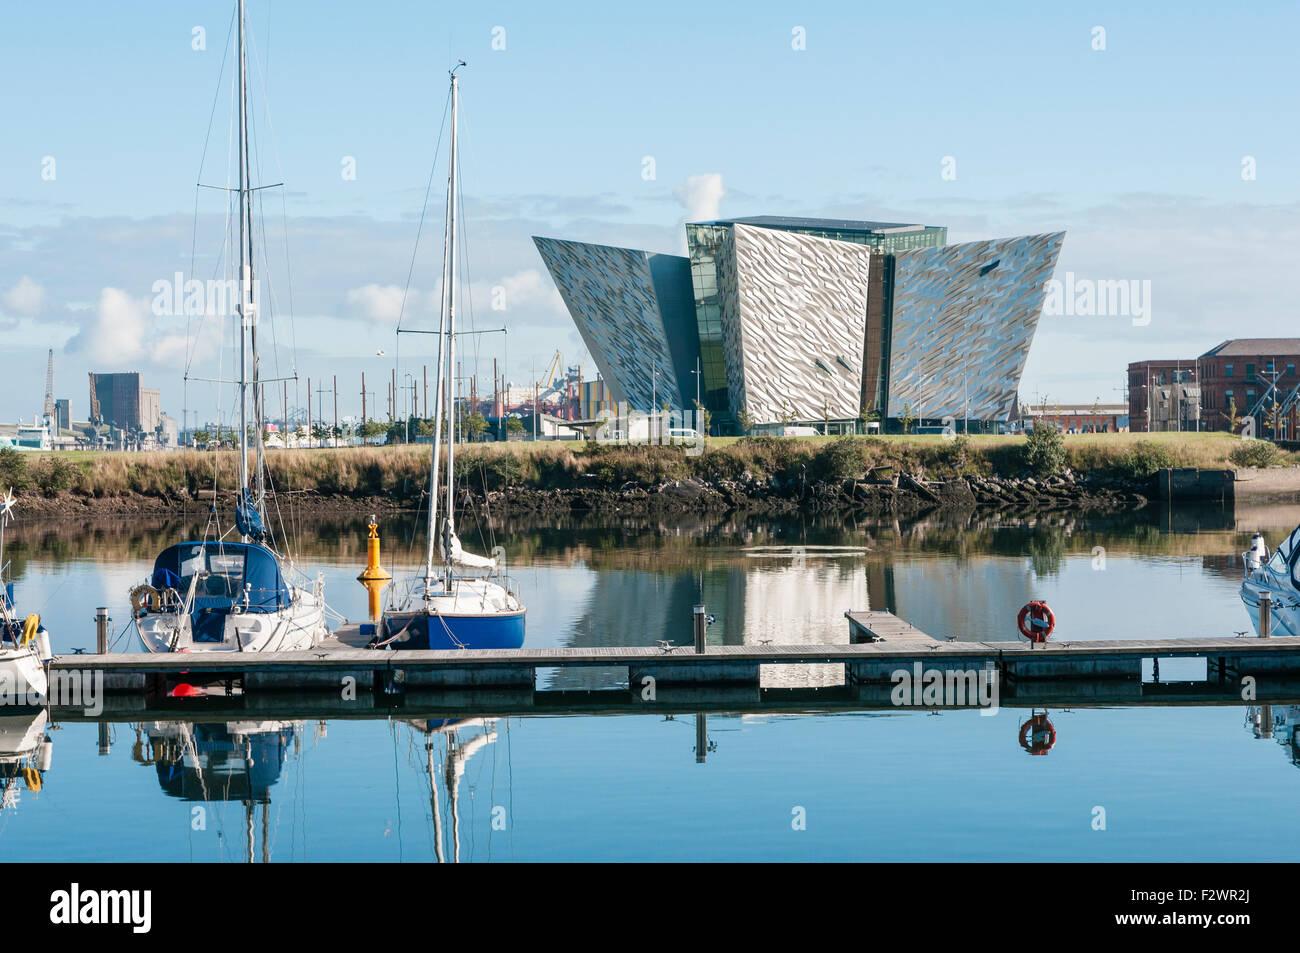 Titanic Visitor Centre, Belfast - Stock Image